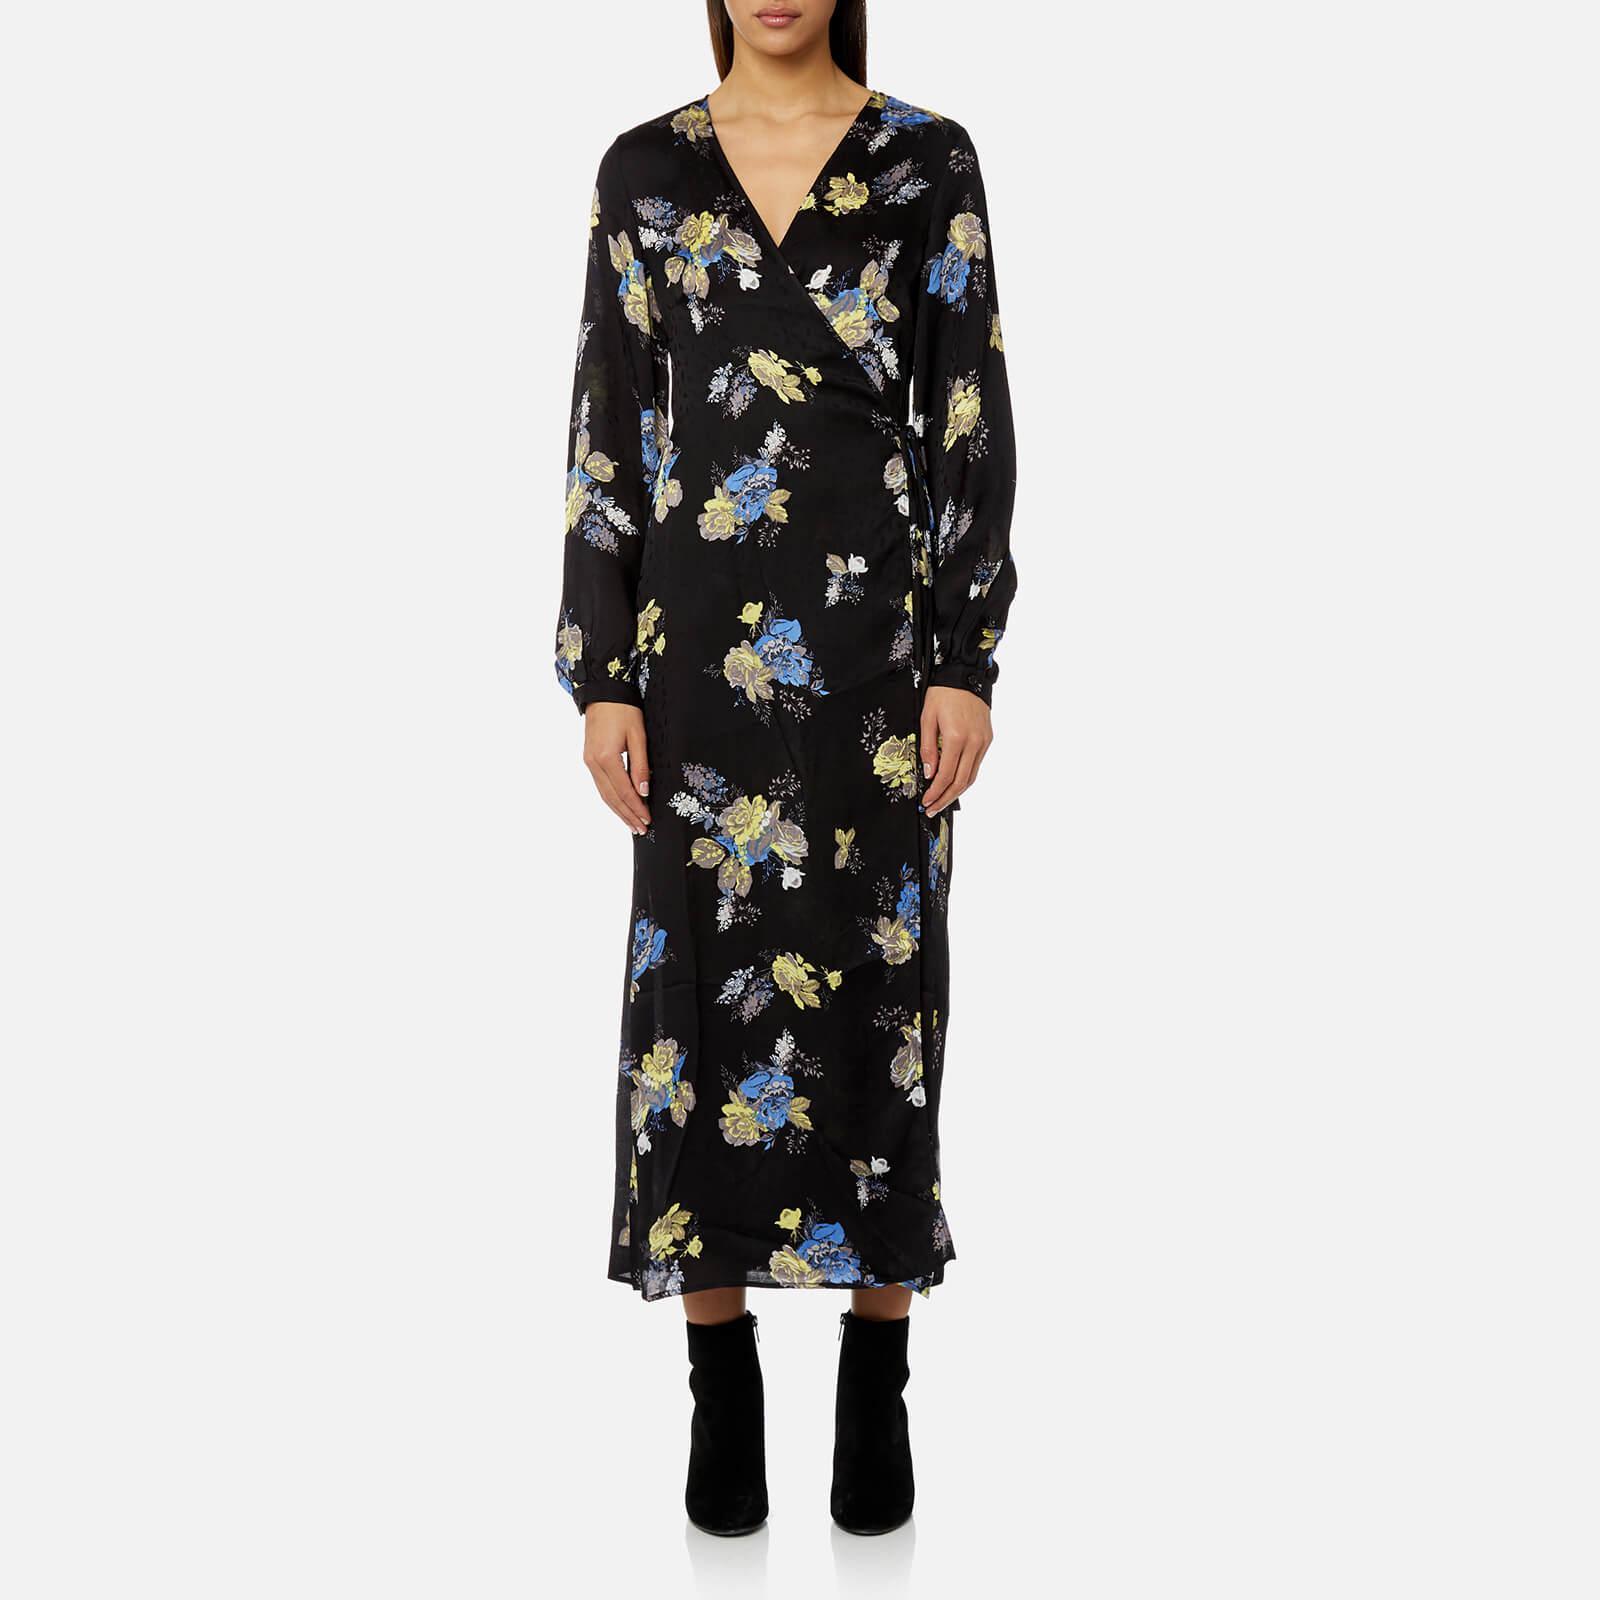 9d06245914c2 Gestuz Aia Flower Maxi Dress in Black - Lyst